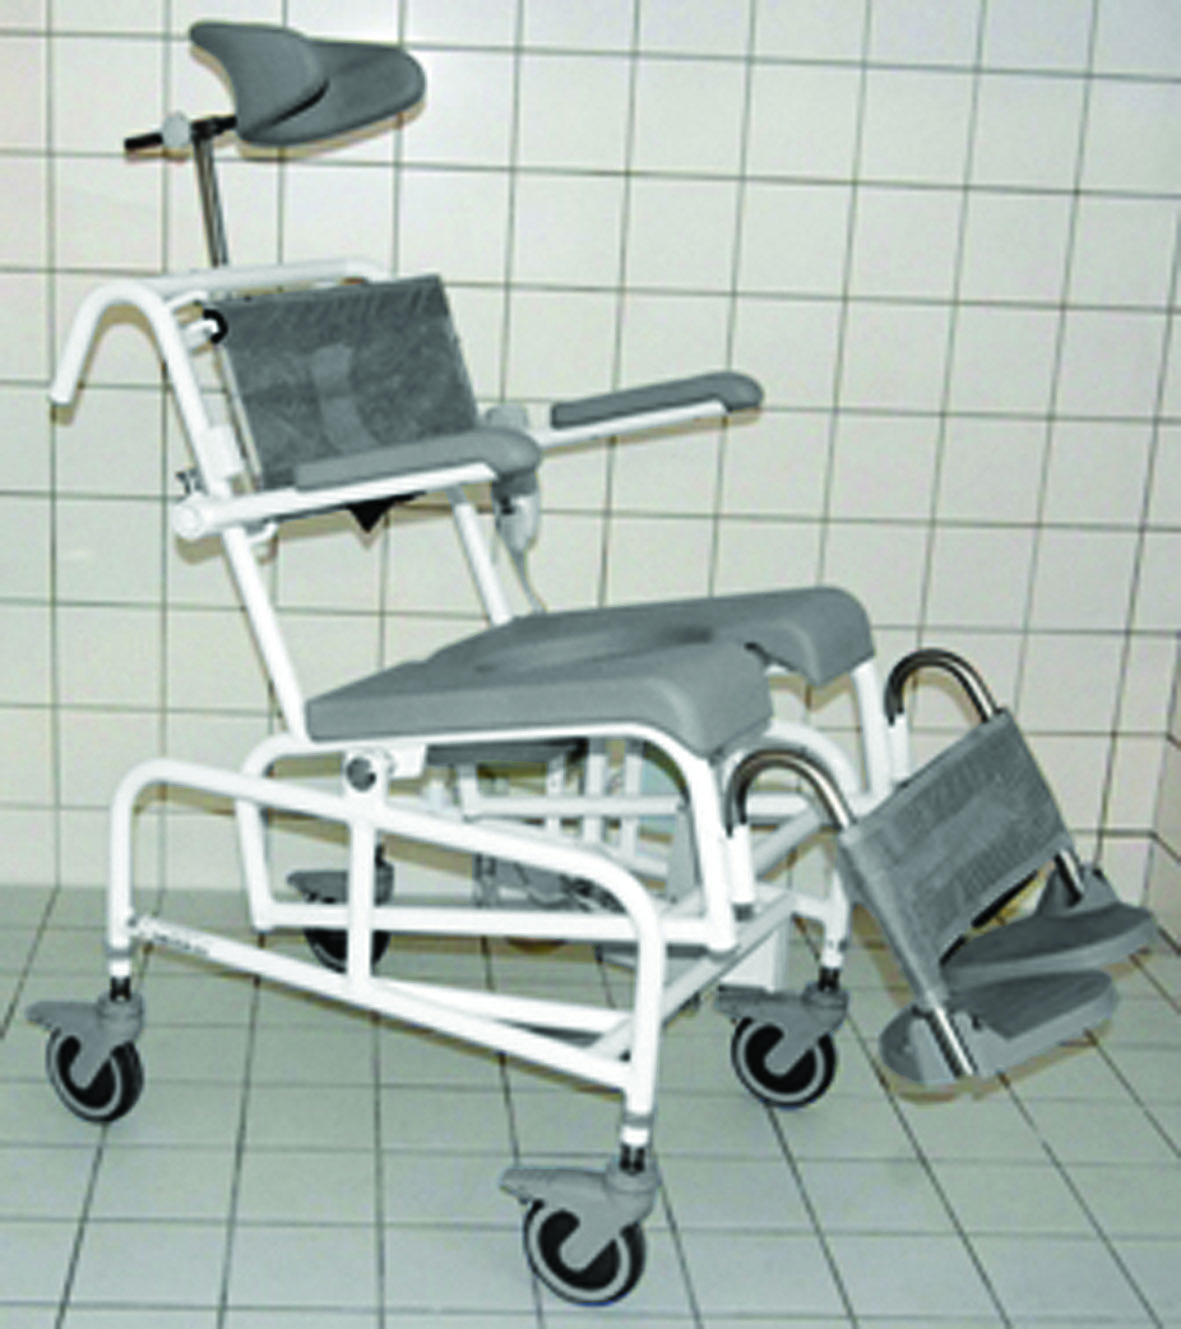 Tilt-in Space Shower Chairs - OT Network